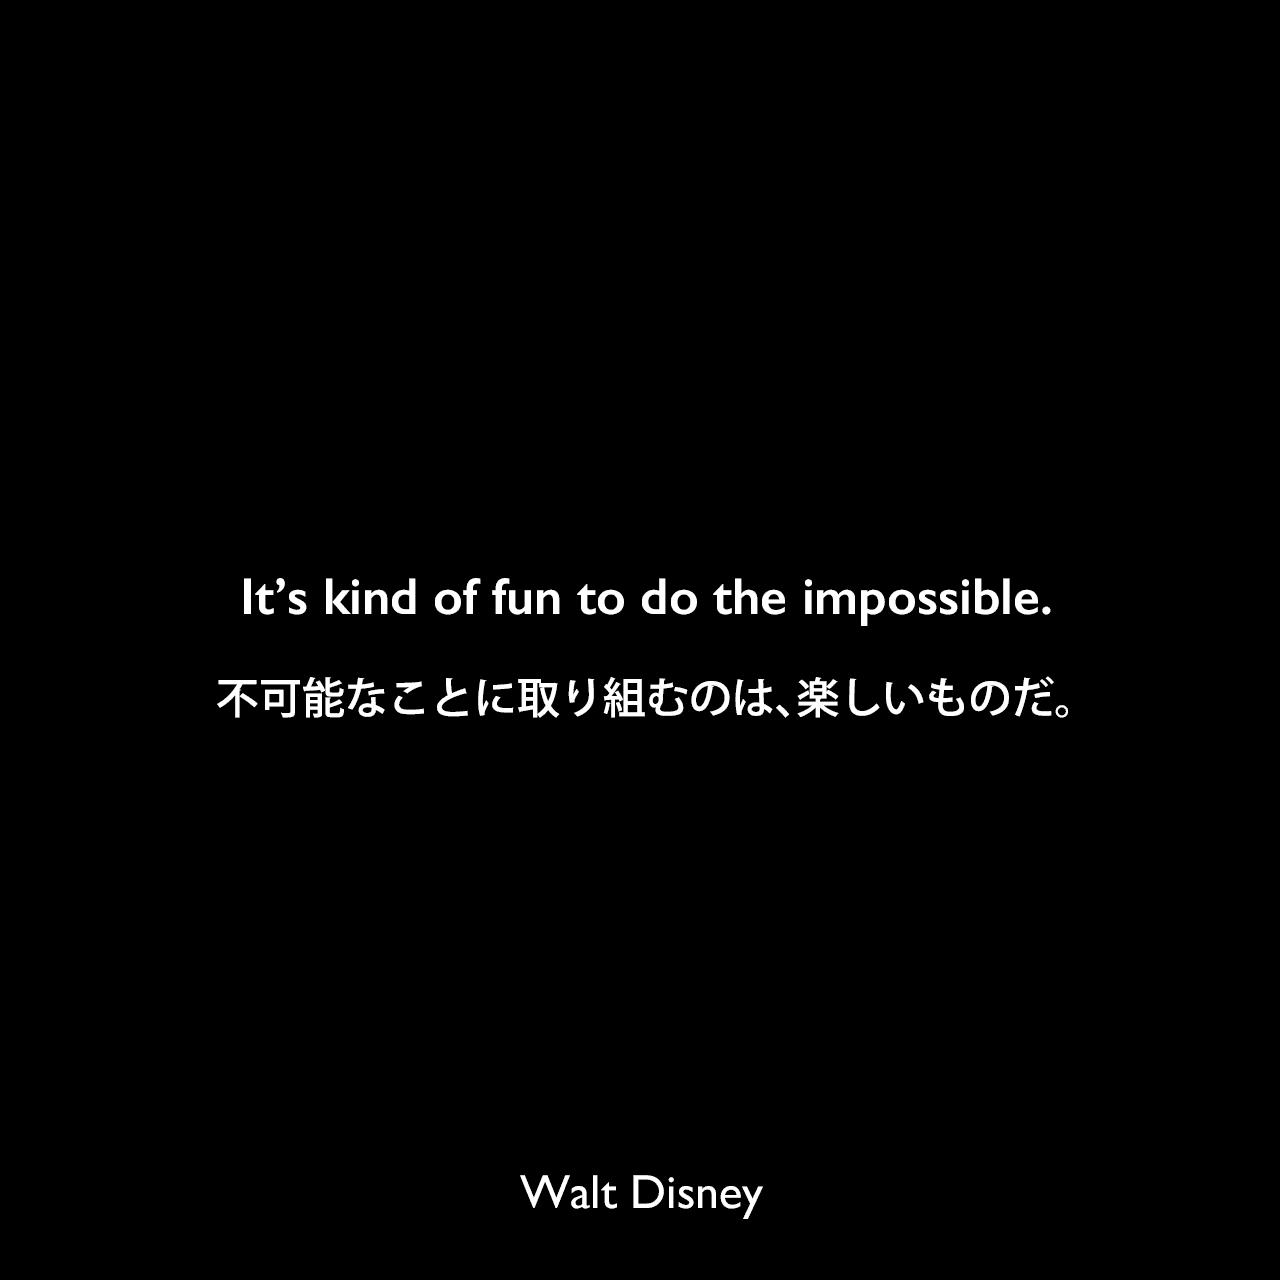 It's kind of fun to do the impossible.不可能なことに取り組むのは、楽しいものだ。- Derek Walkerによる本「Animated Architecture」よりWalt Disney